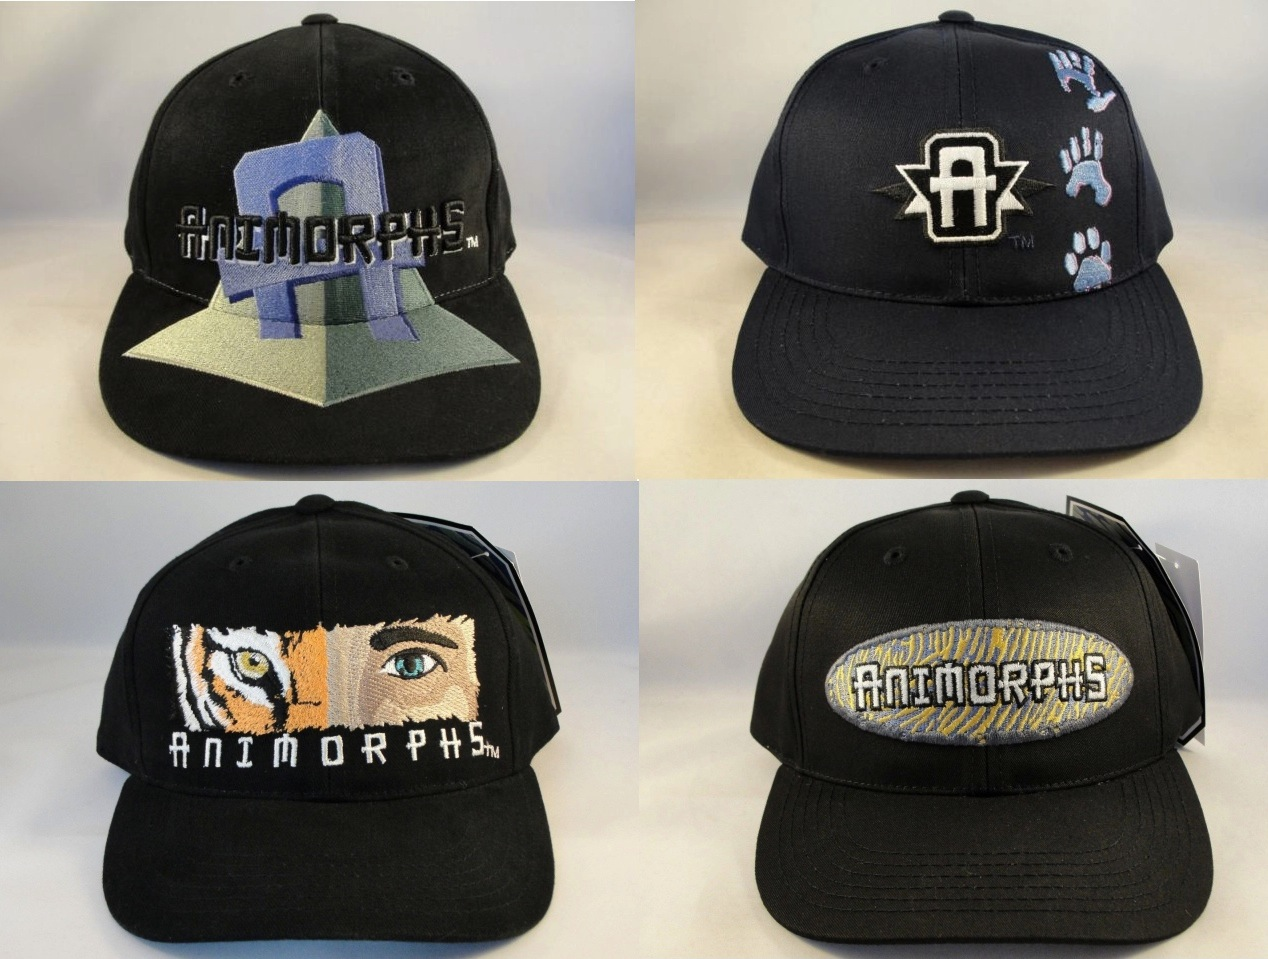 American Needle Baseball Caps  19318396f4f